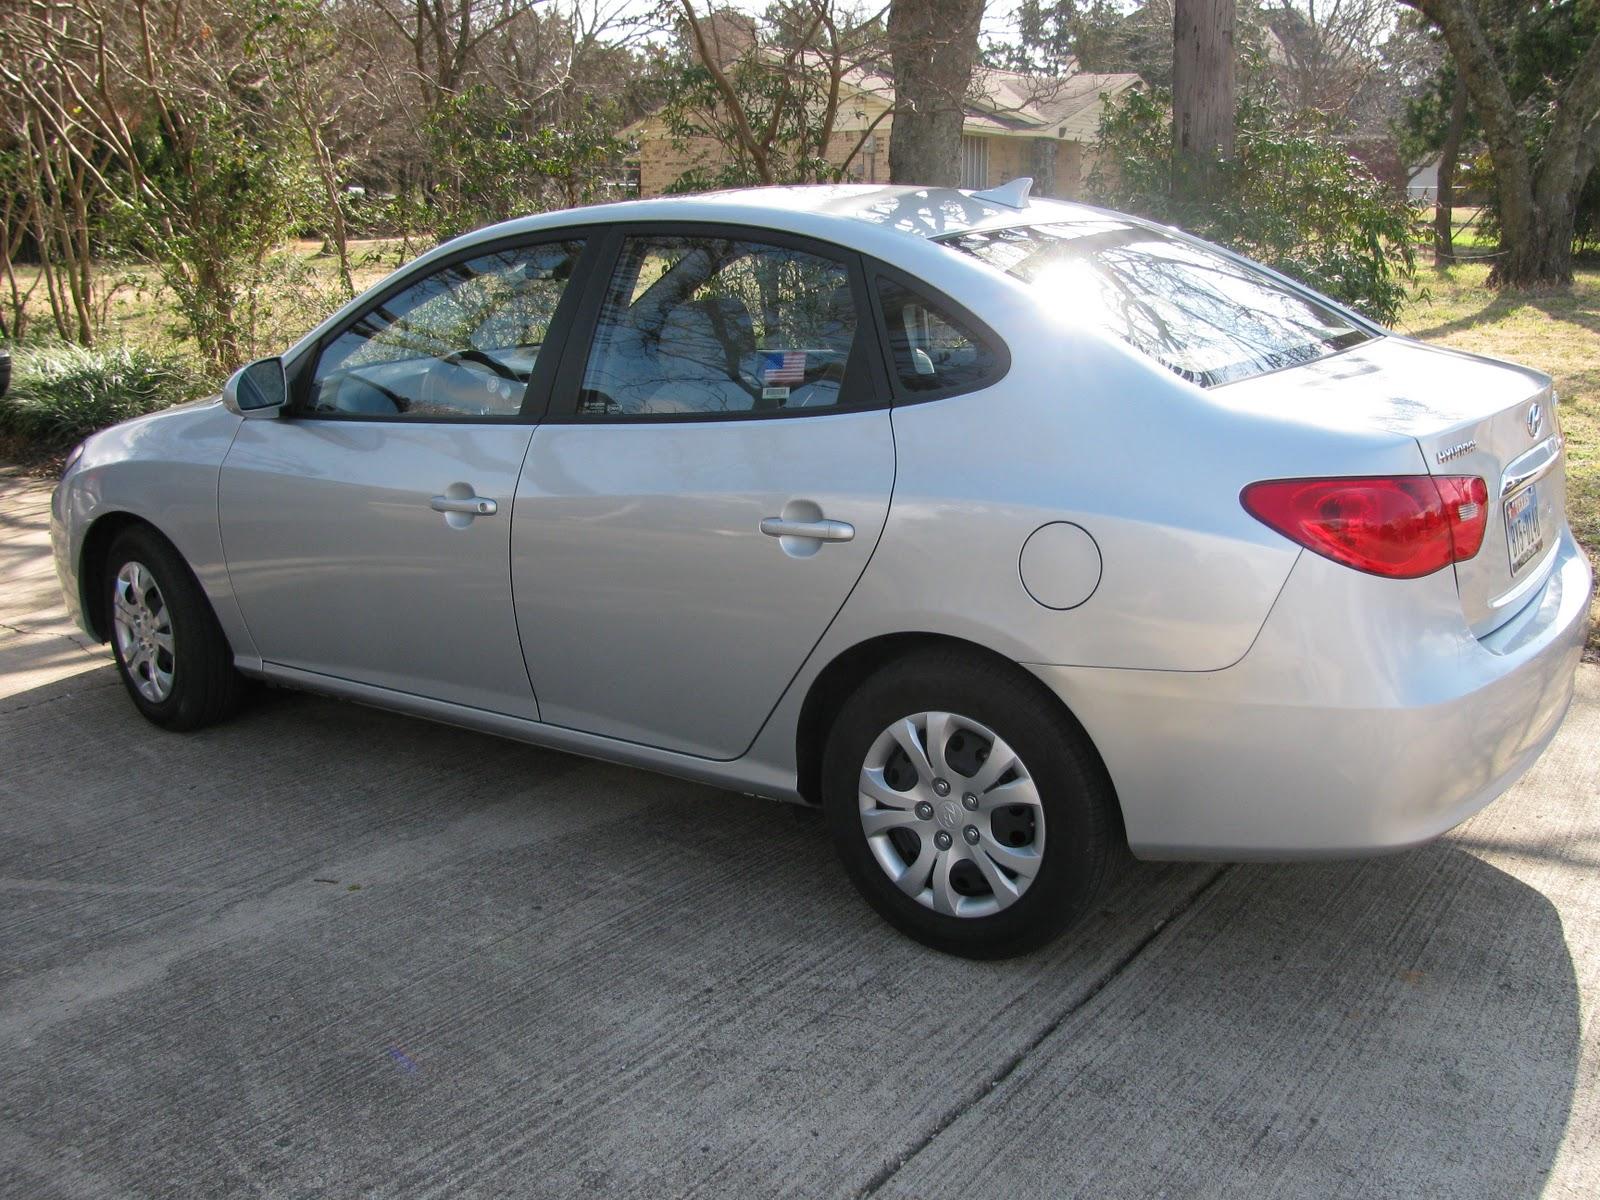 2010 Hyundai Elantra - Information and photos - ZombieDrive